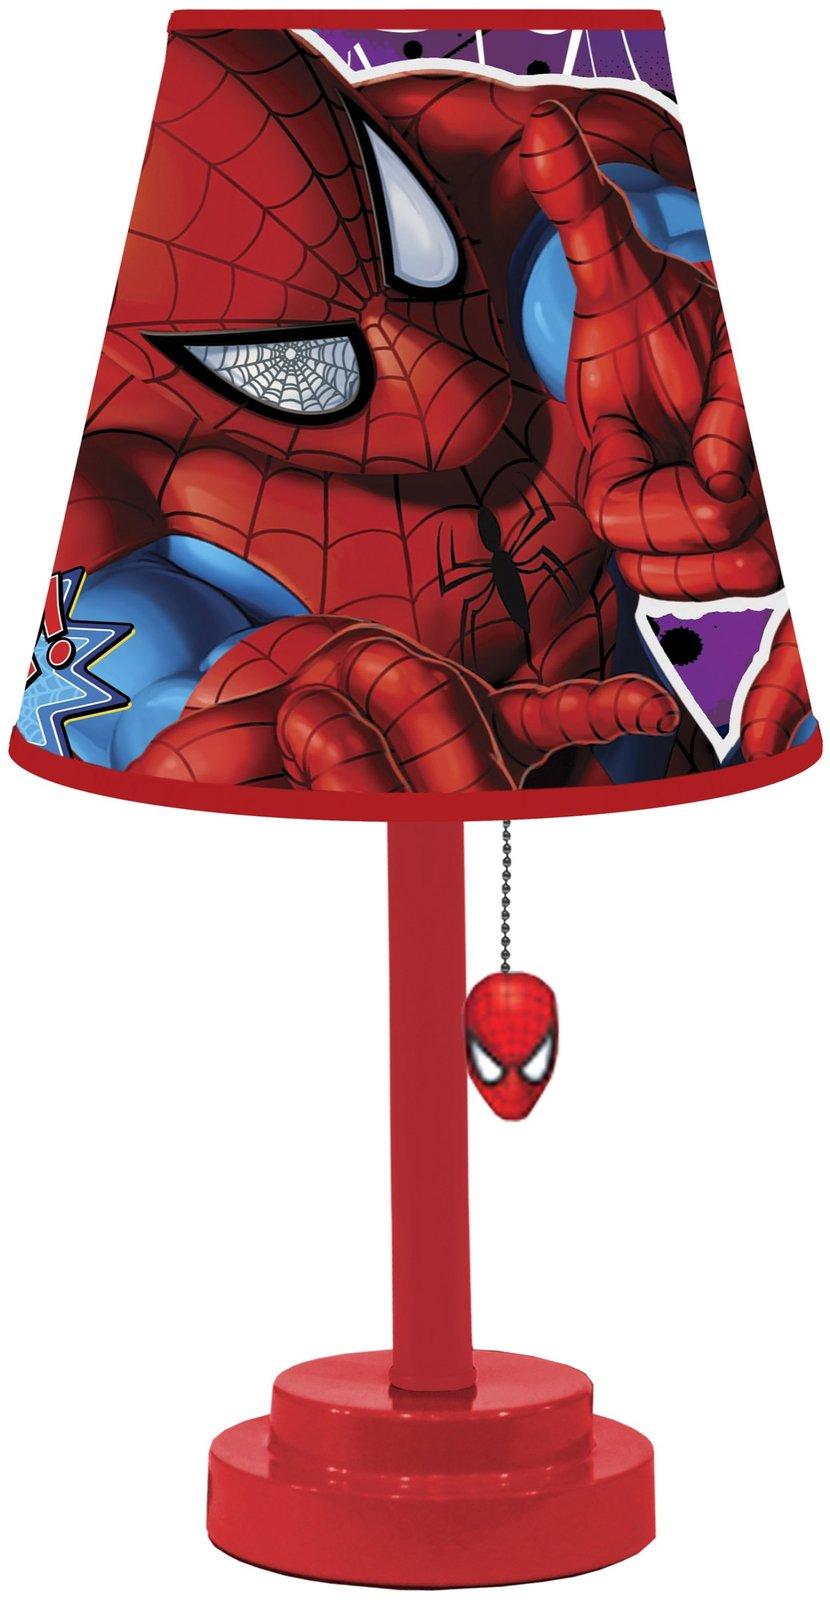 10 facts about Spider man lamp  Warisan Lighting